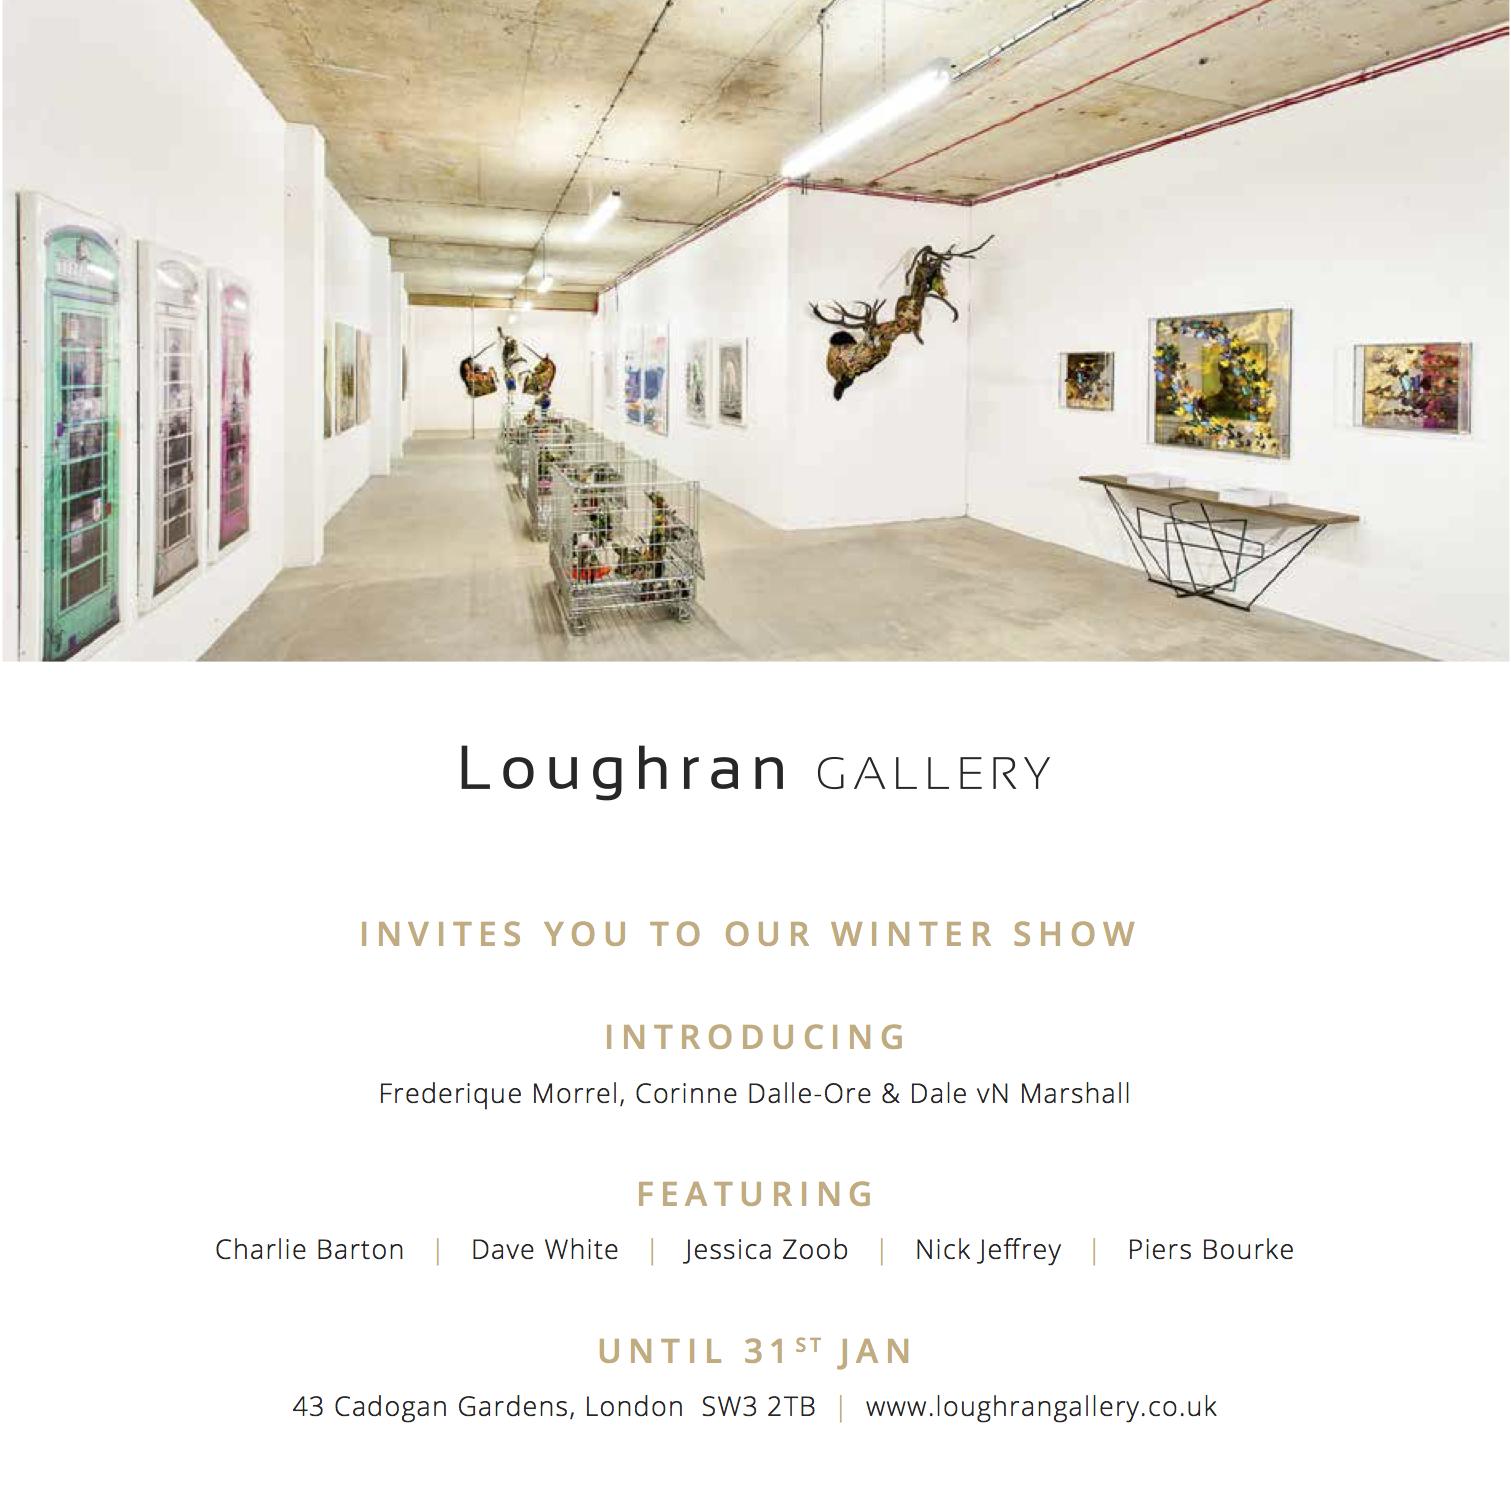 Loughran Gallery